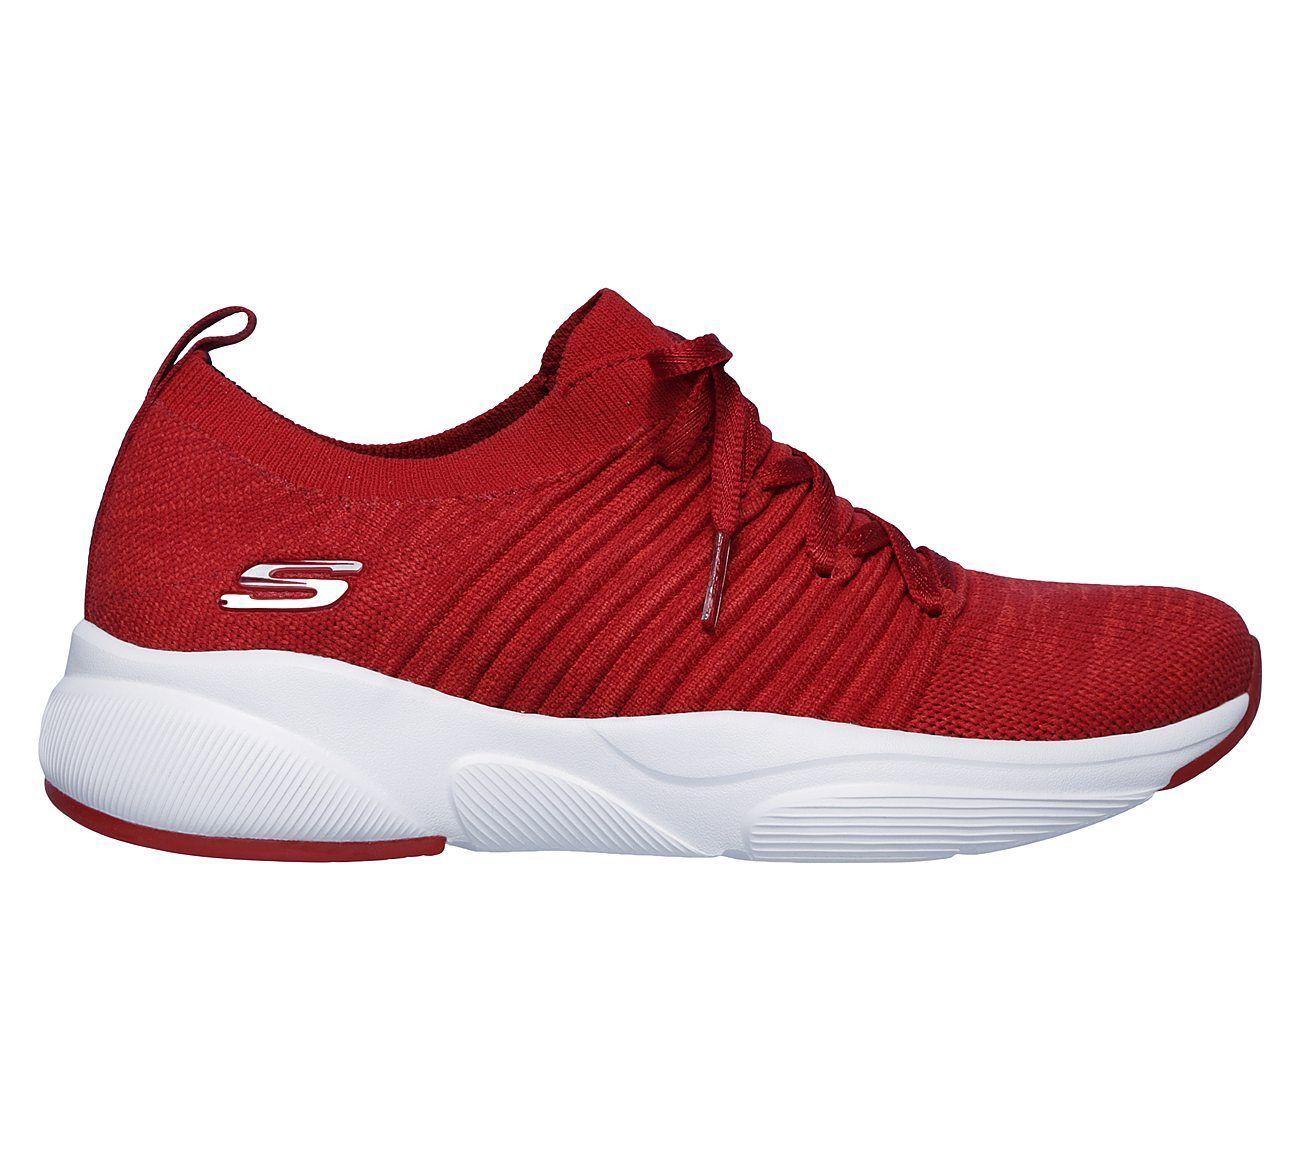 Skechers Red shoes Memory Foam Women Slip On Comfort Casual Athletic train 13024